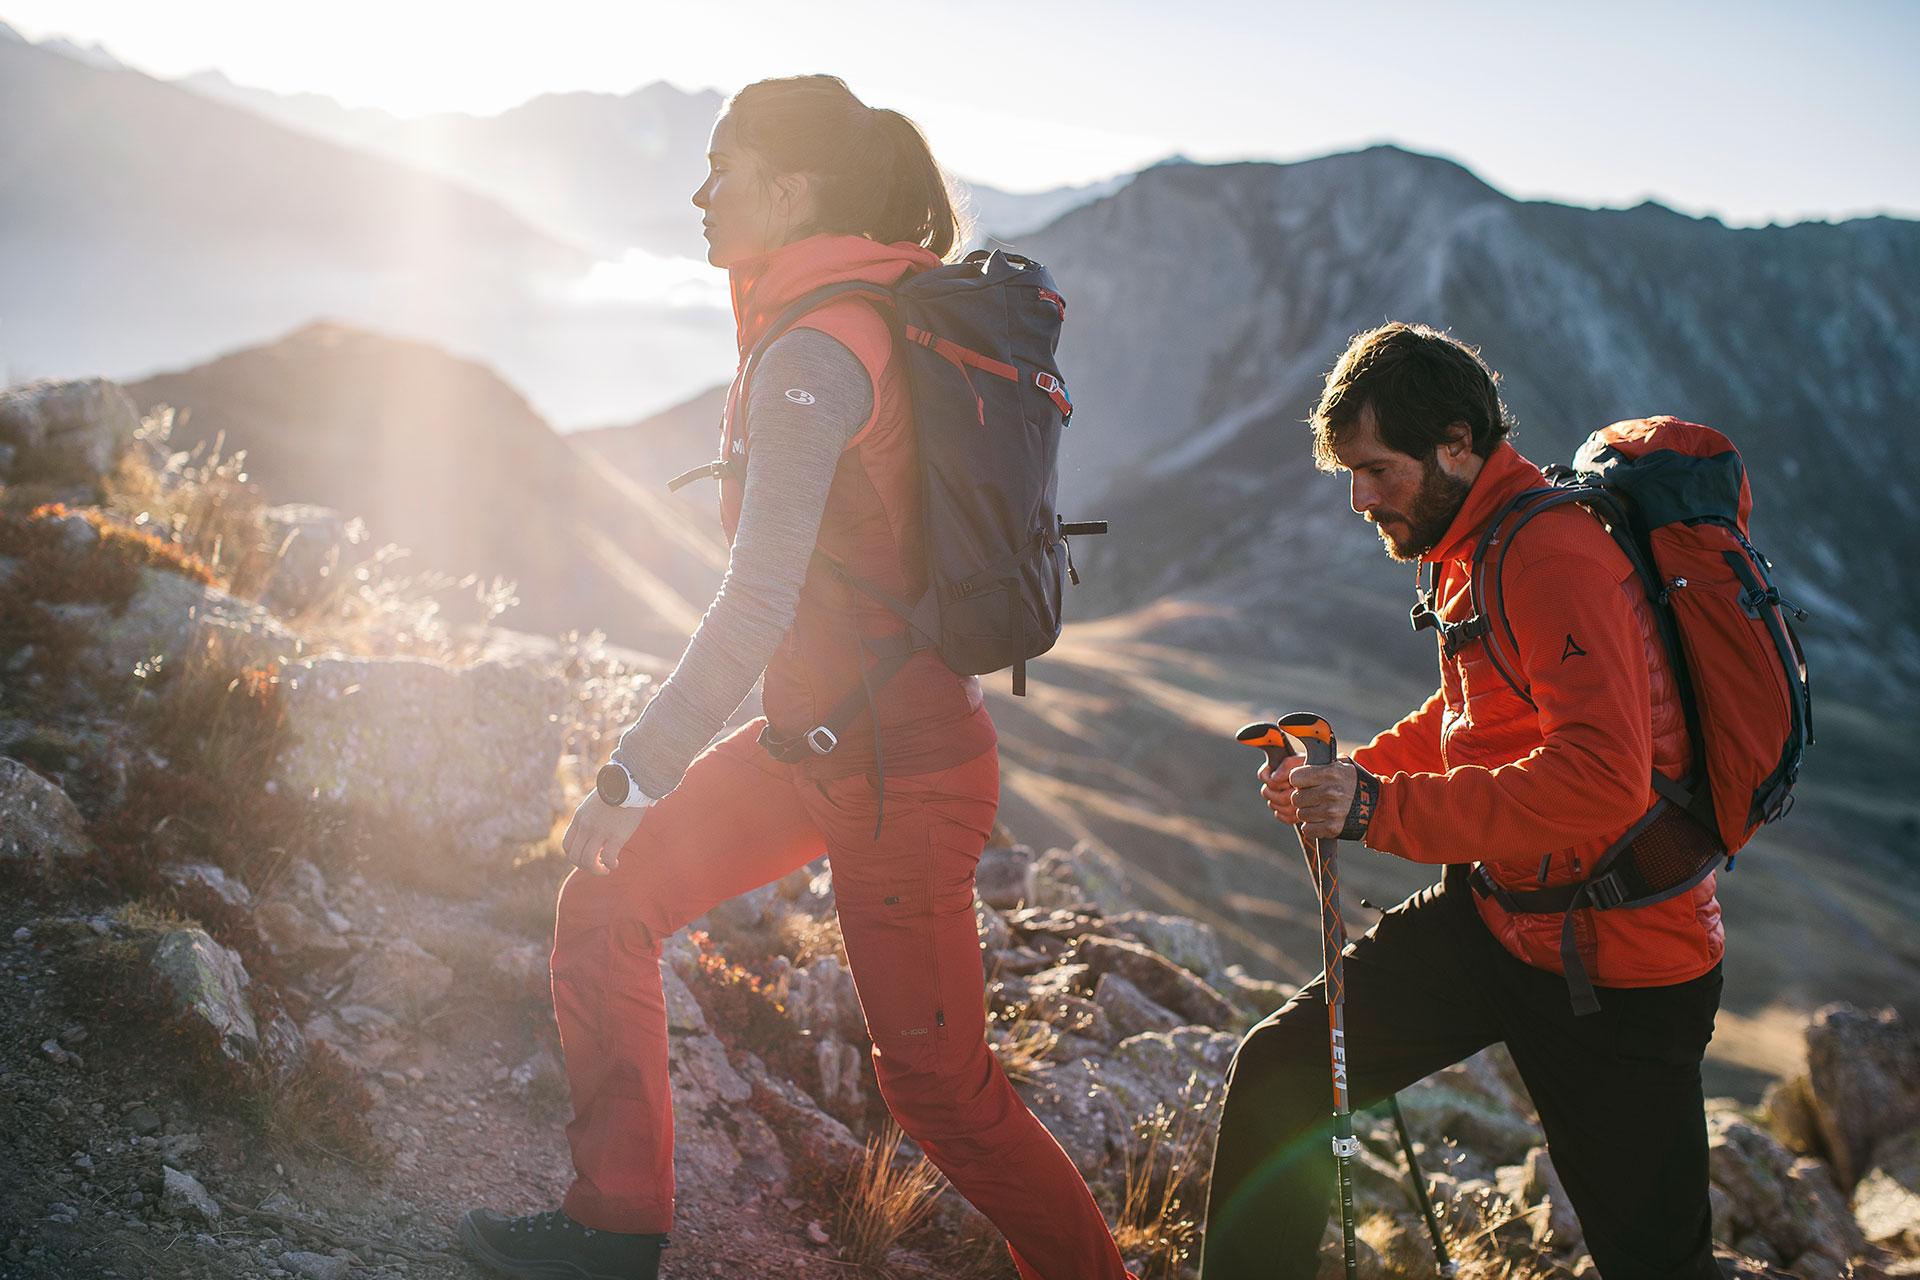 Berge München Hiking Wandern Bergsport Fotograf Micheal Müller New York USA